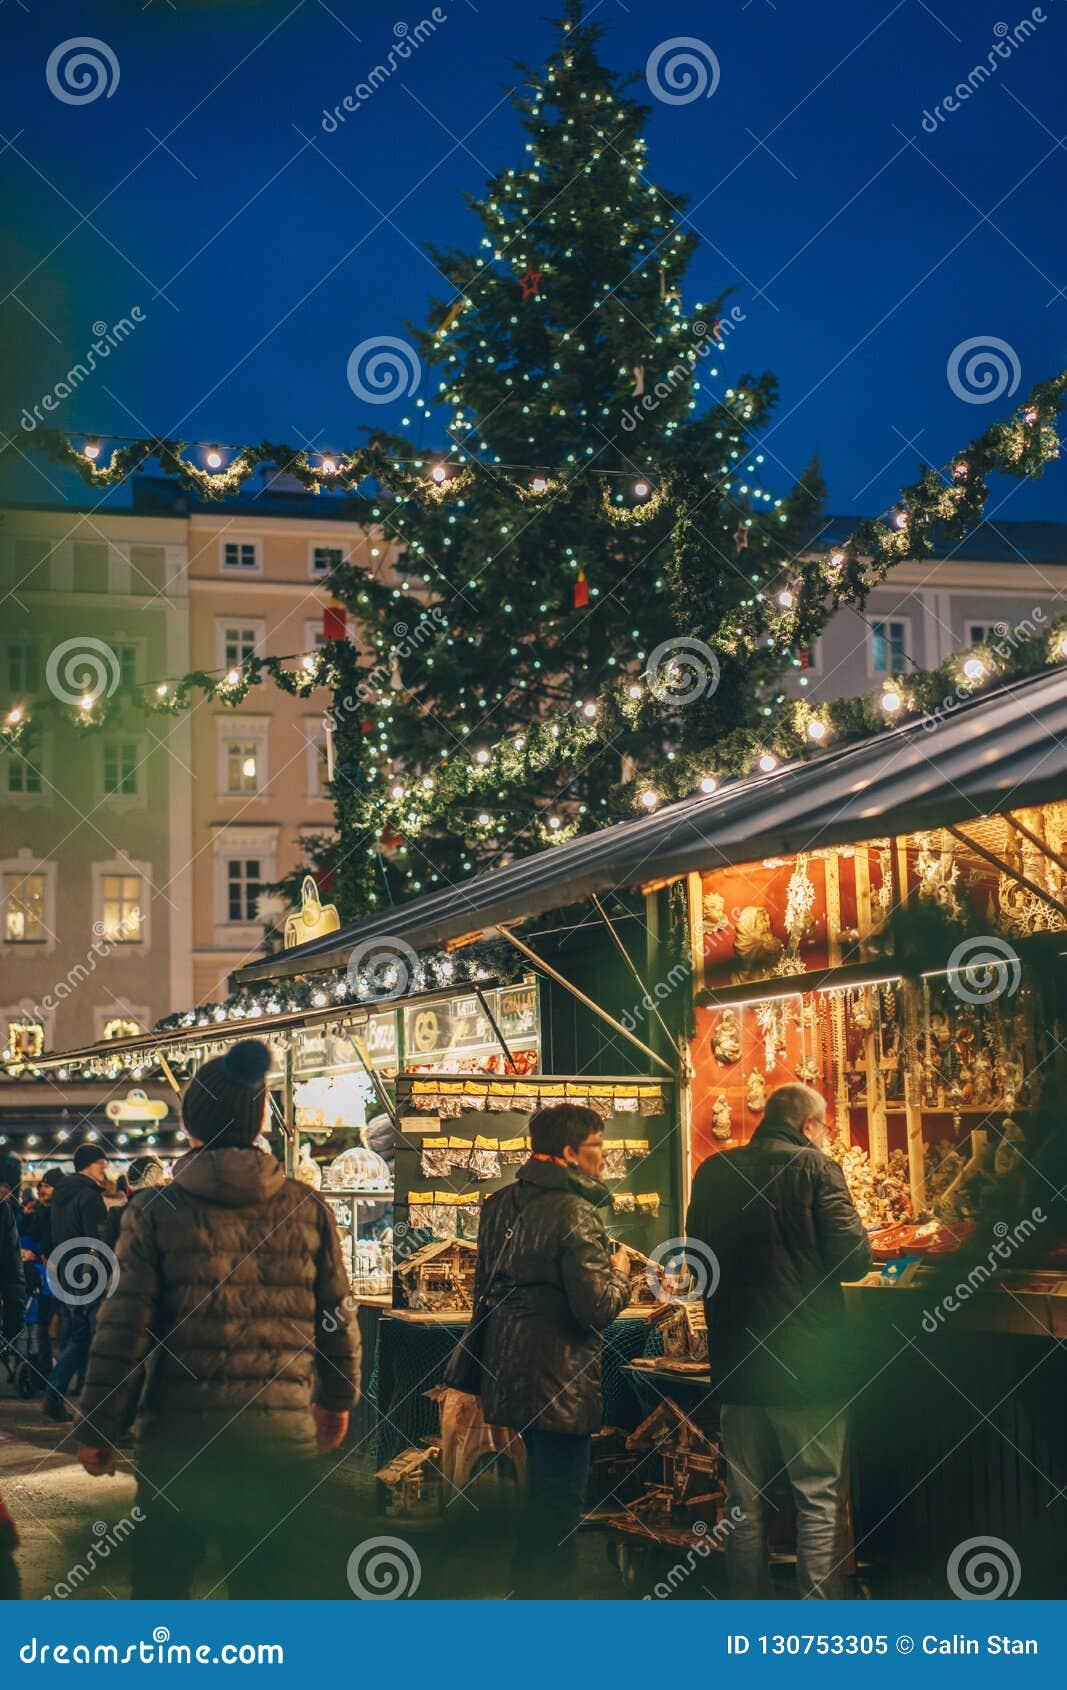 Salzburg Christmas Market.Inside The Salzburg Christmas Market At Night Shot Trough A